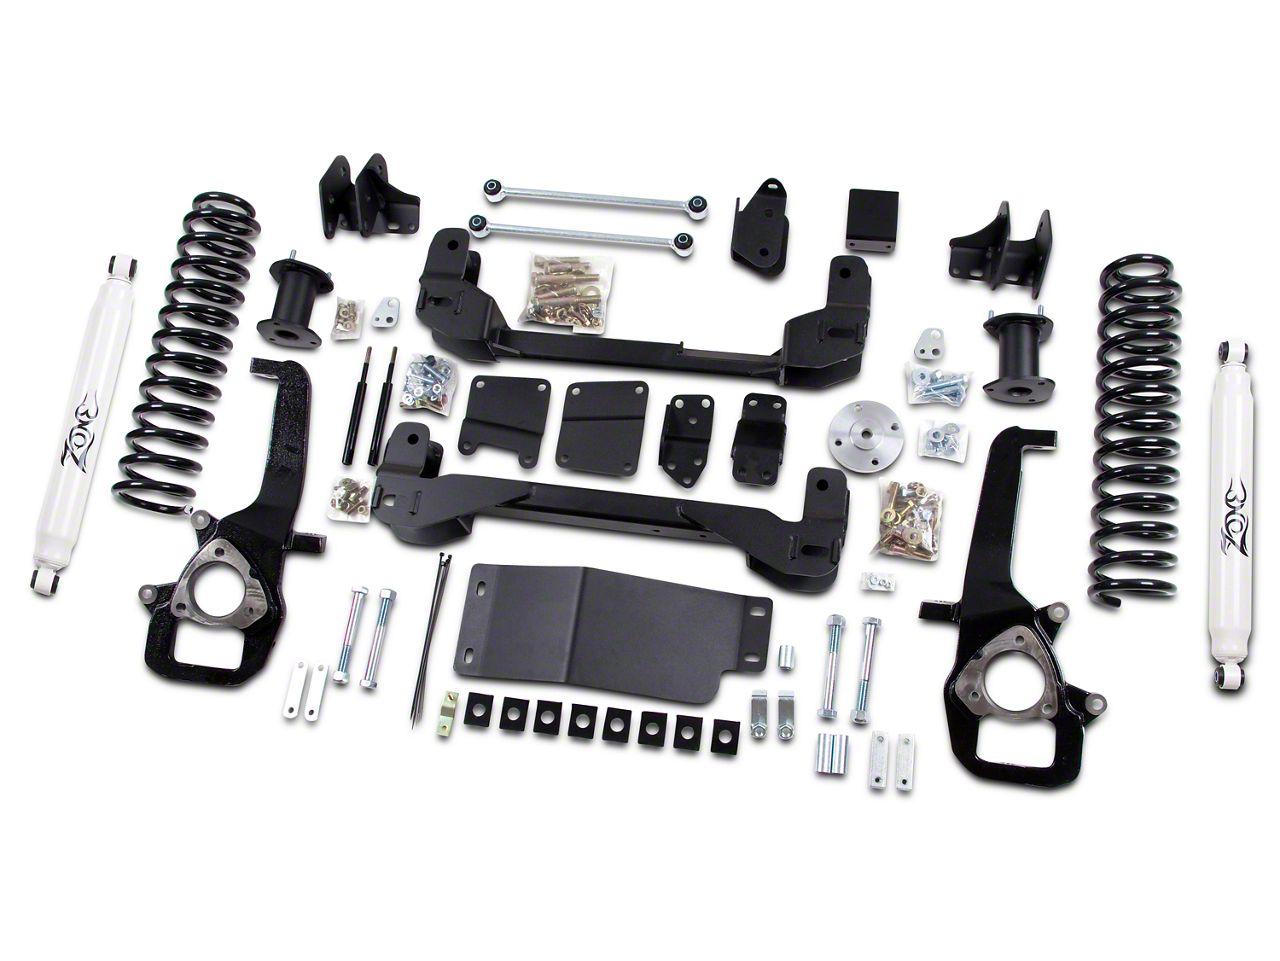 Zone Offroad 6 in. Suspension Lift Kit w/ 5 in. Rear Springs & Nitro Shocks (13-18 4WD w/o Air Ride Suspension)